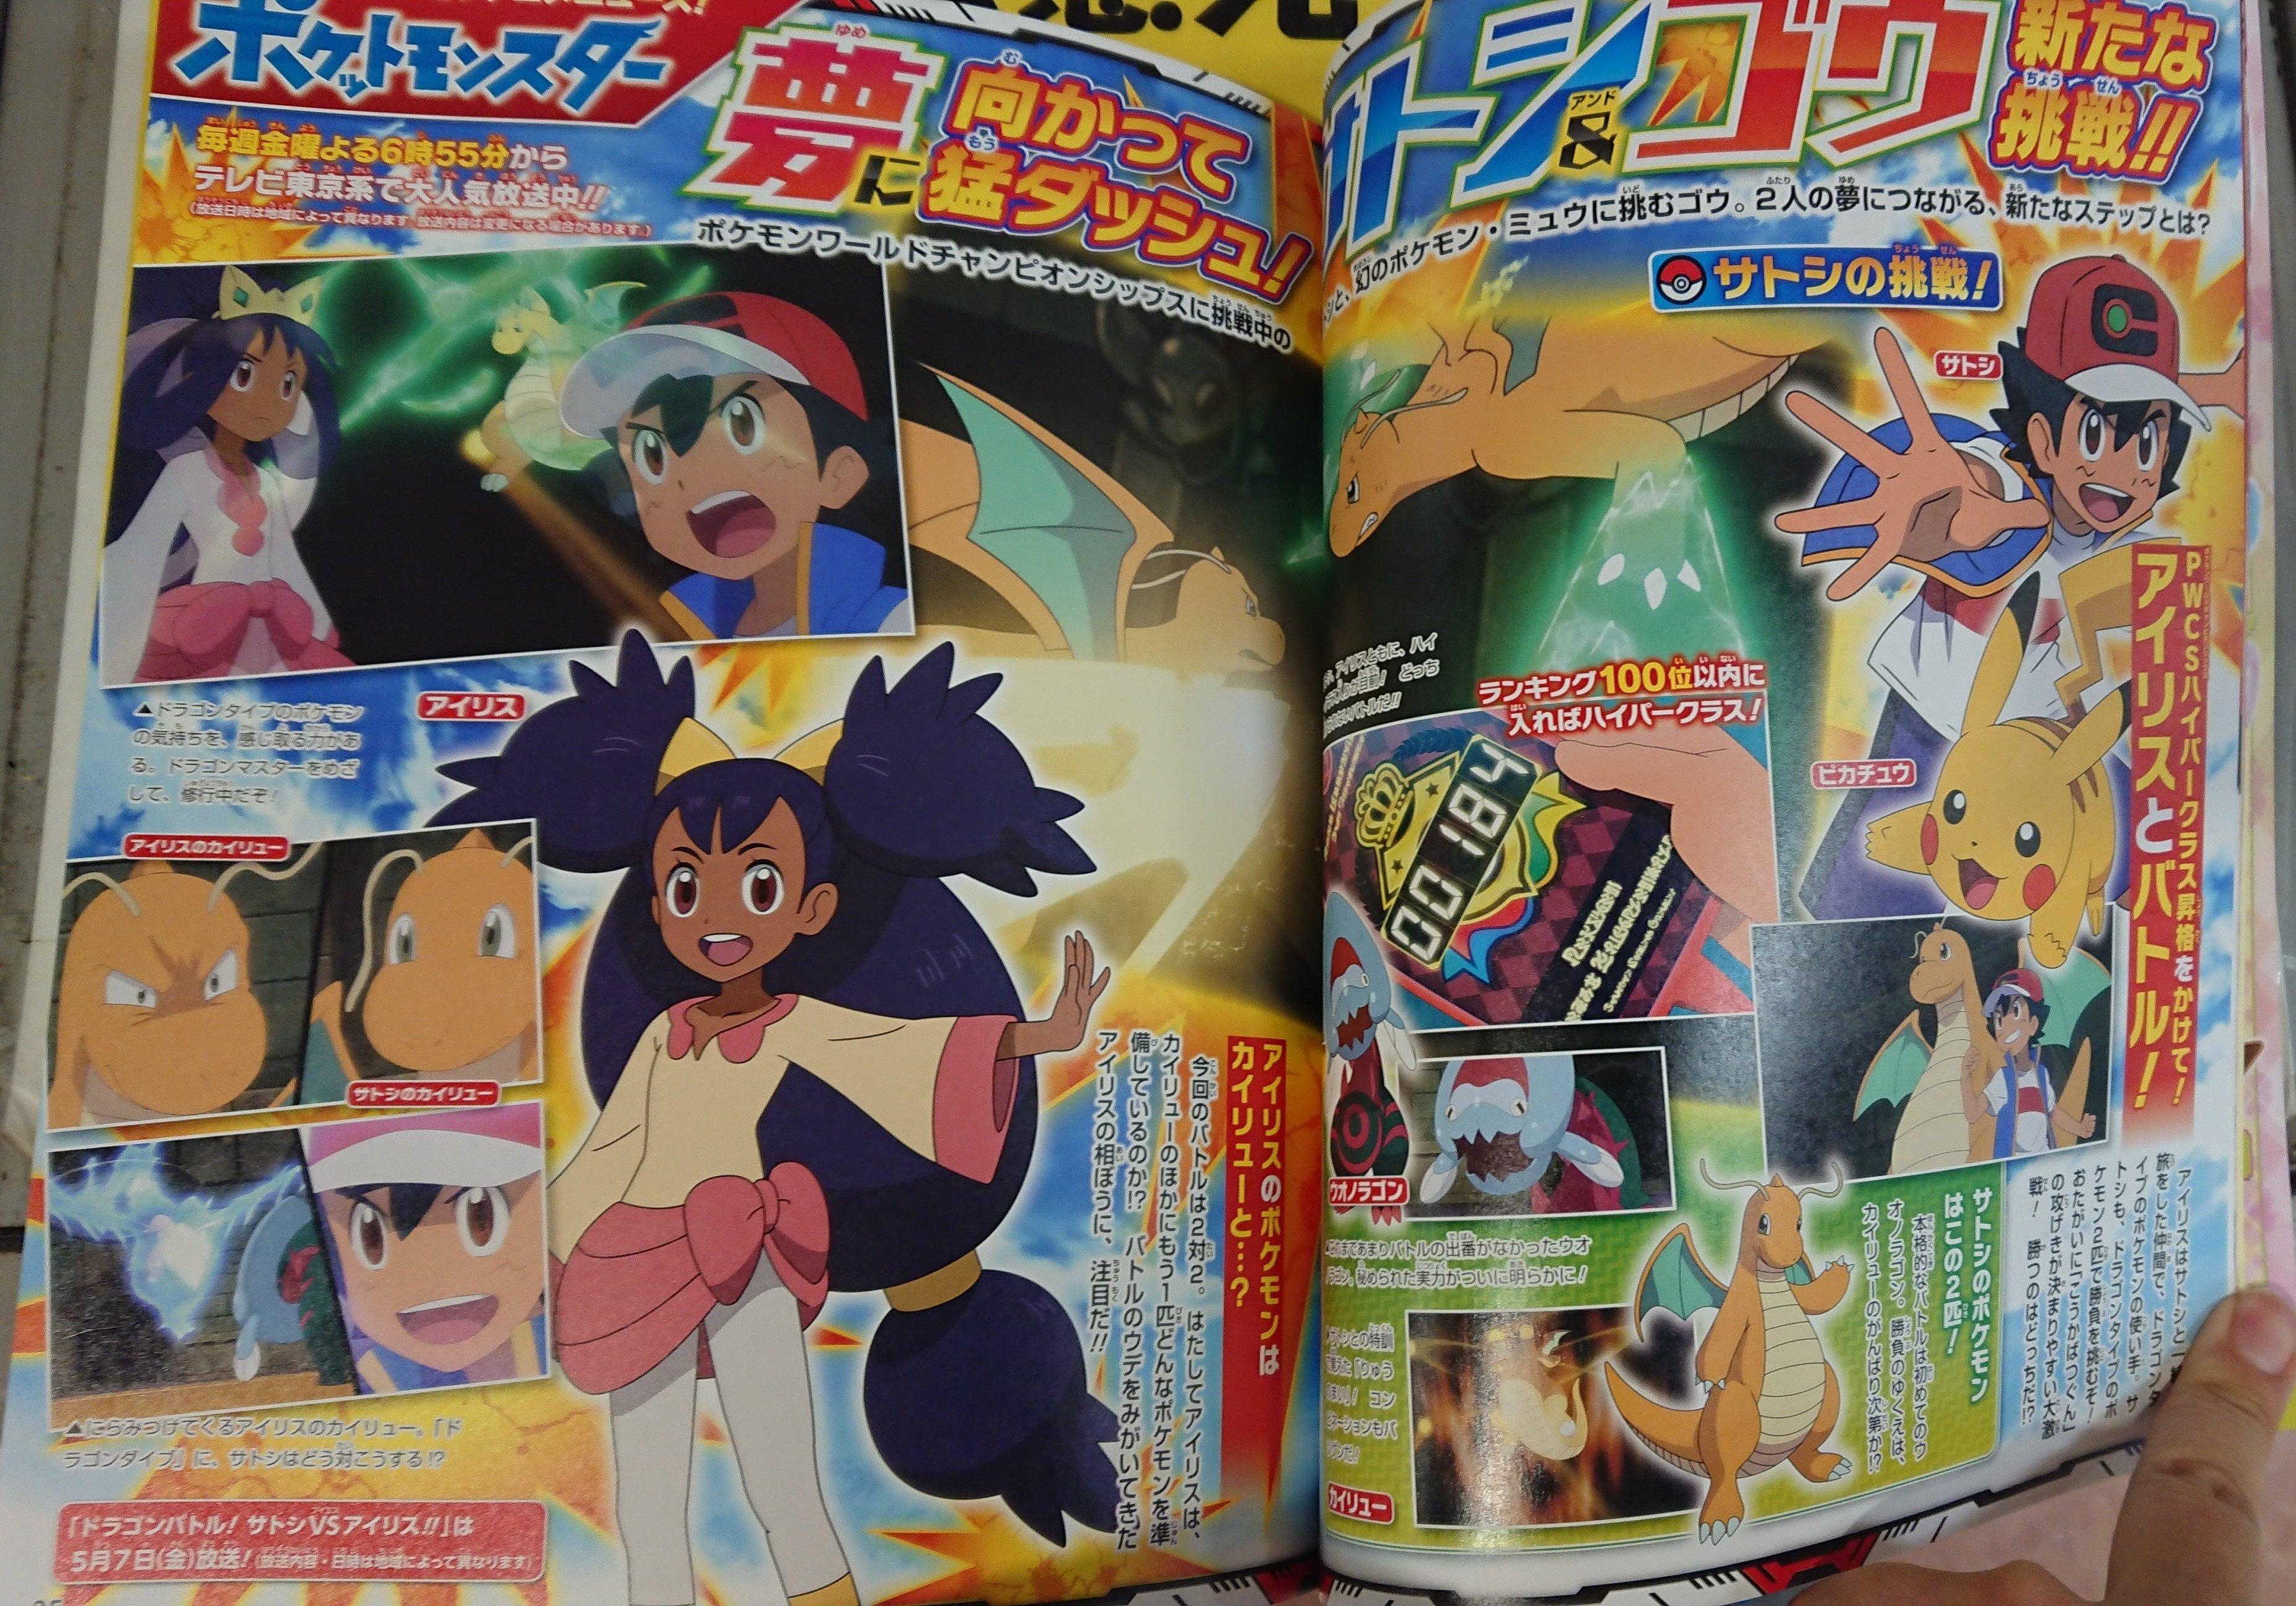 Iris vs Ash Pokémon Viajes Project Mew